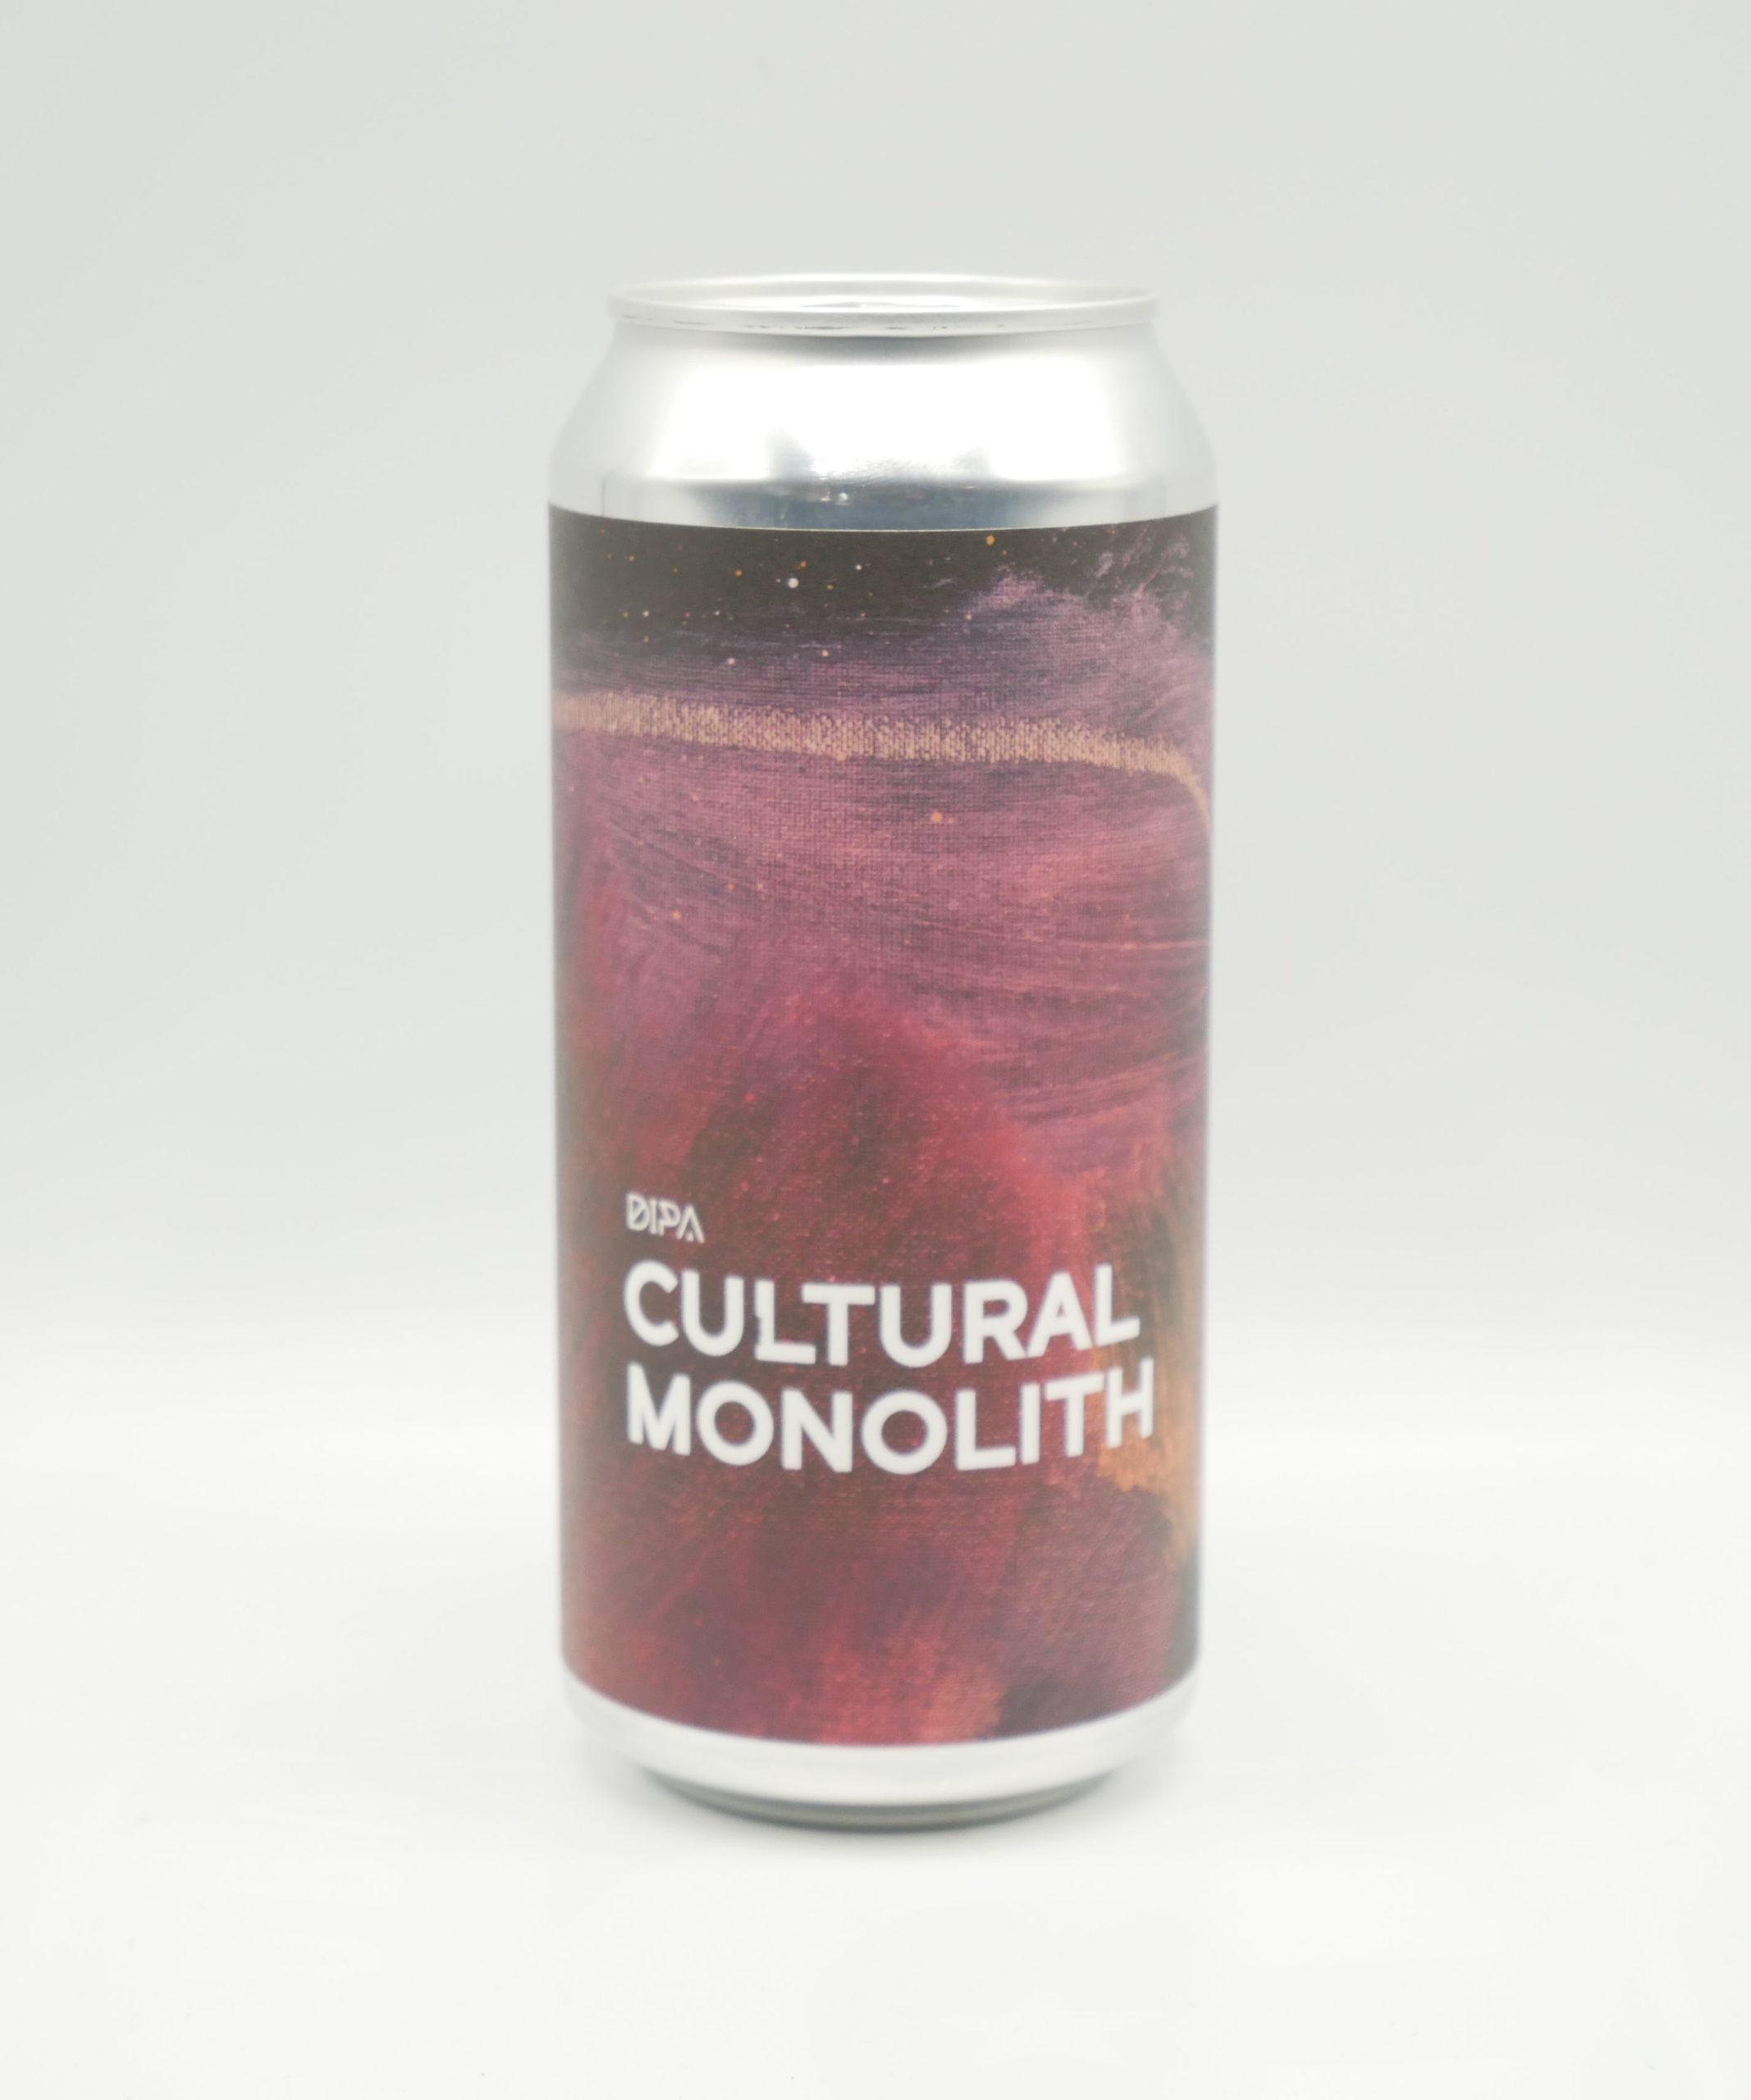 Image Cultural Monolith dipa